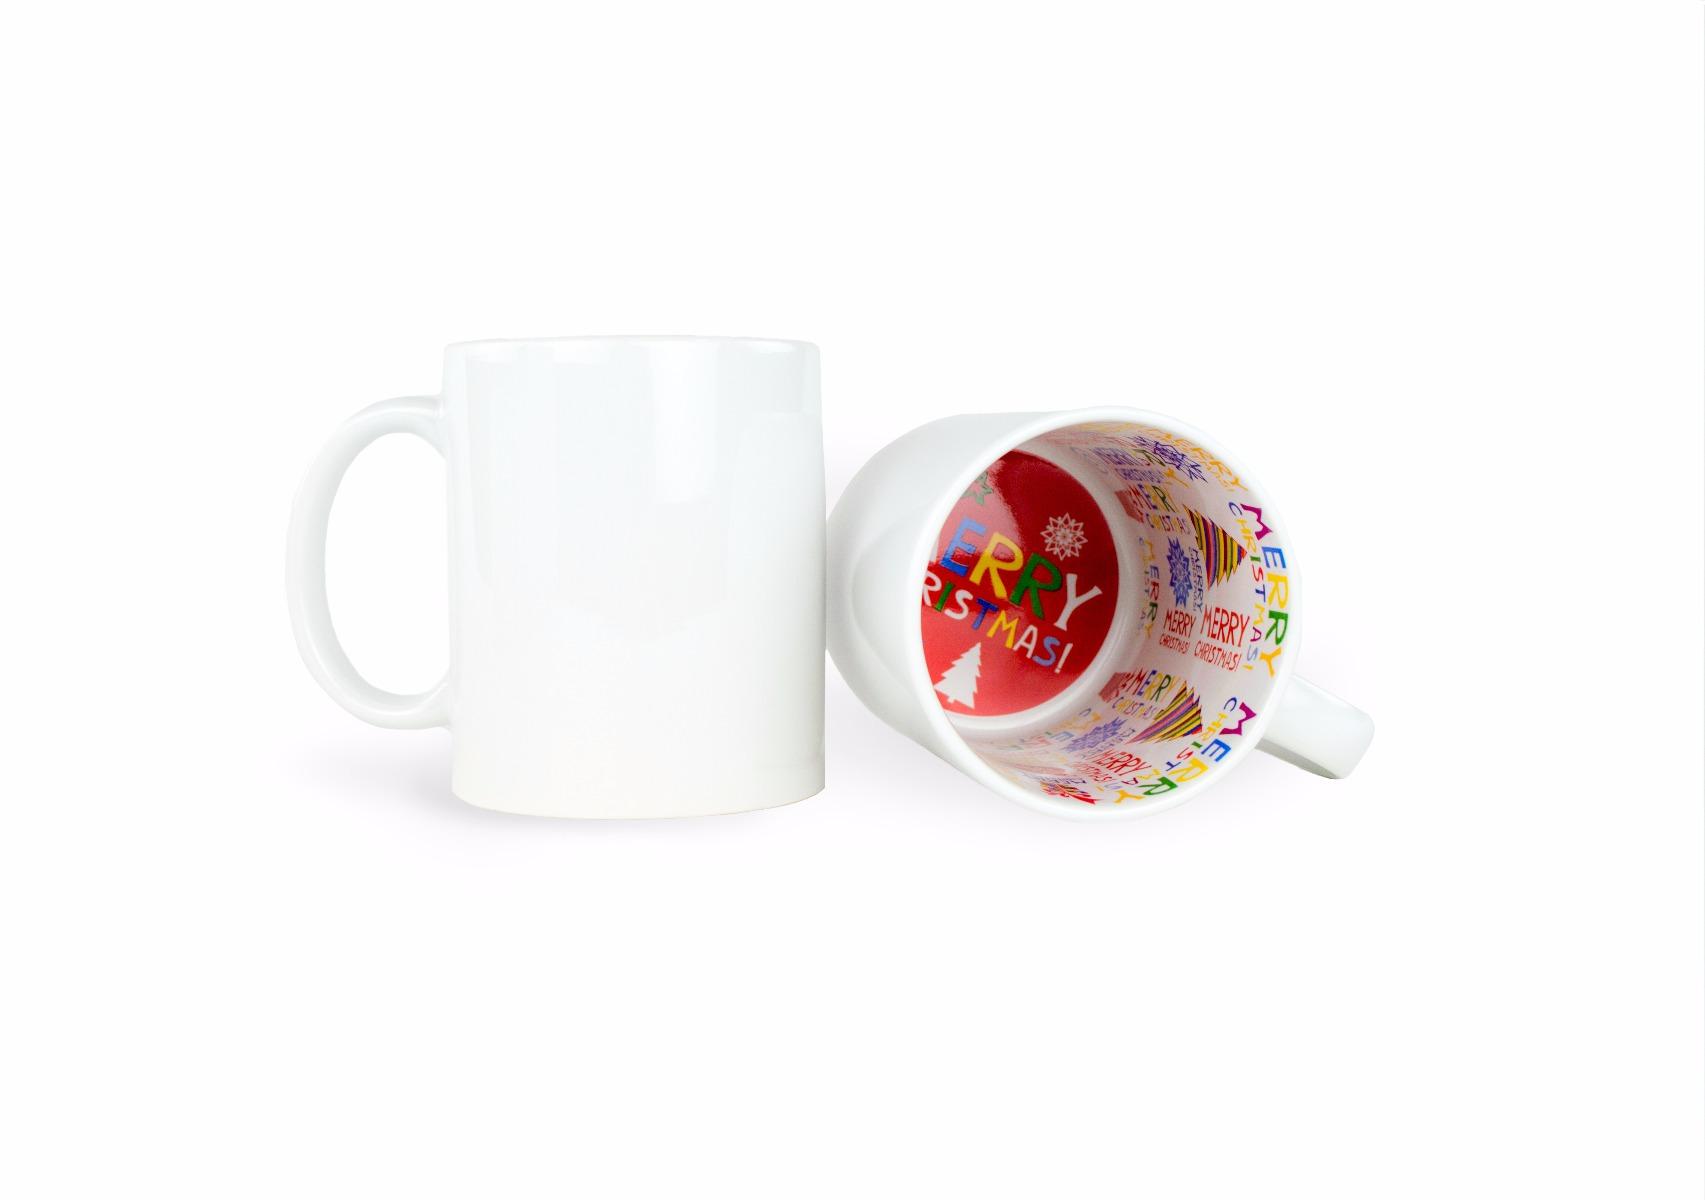 White Ceramic Sublimation Coffee Mug - 11oz.